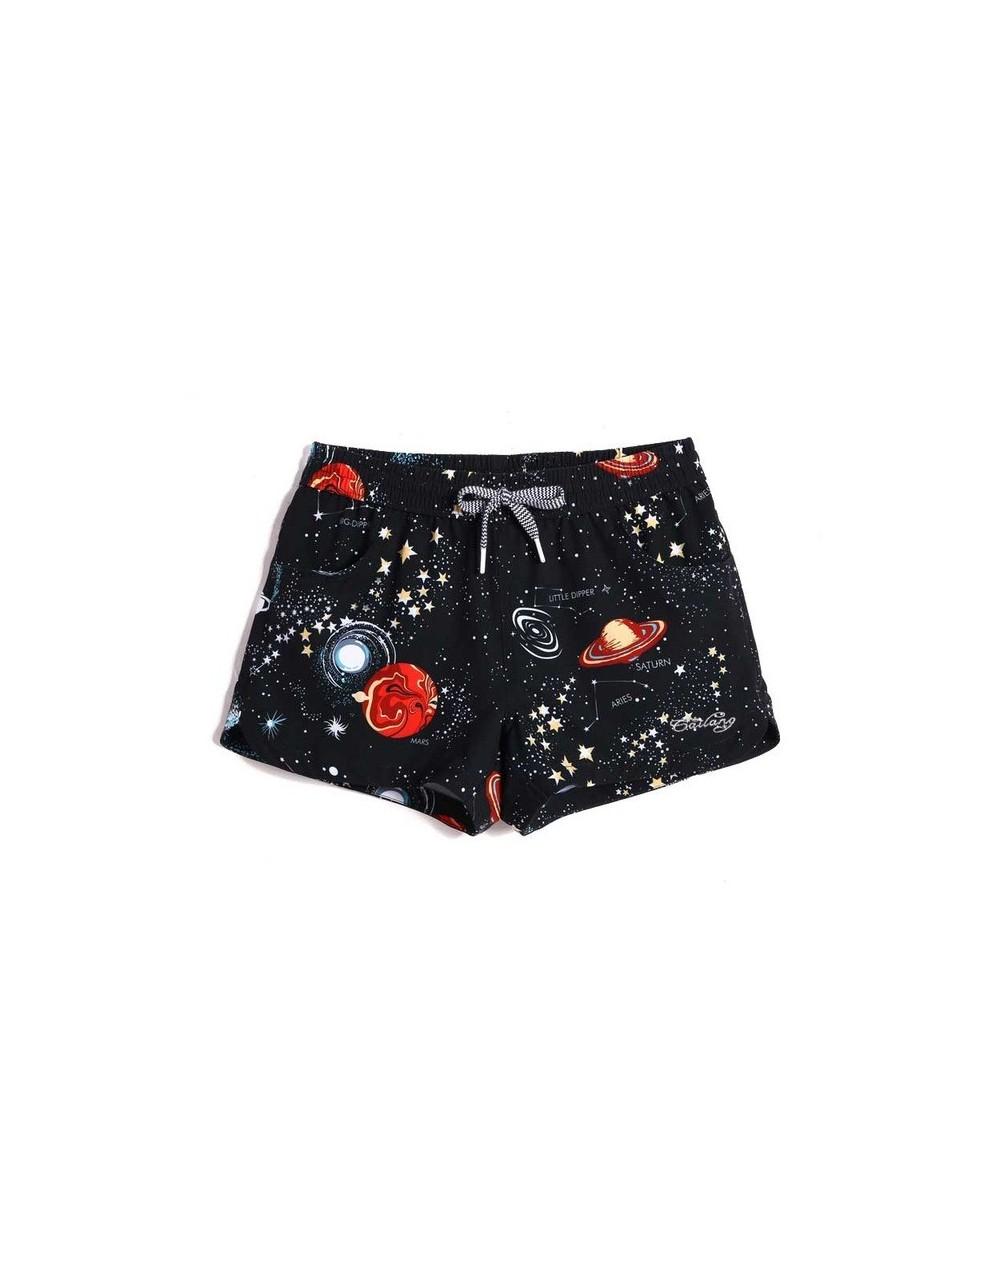 Brand Woman Shorts Boardshorts Casual Board Boxer Trunks Swimwear Swimsuits Slim Fit Lady Mini Fashion Short Boxer - H1118 -...